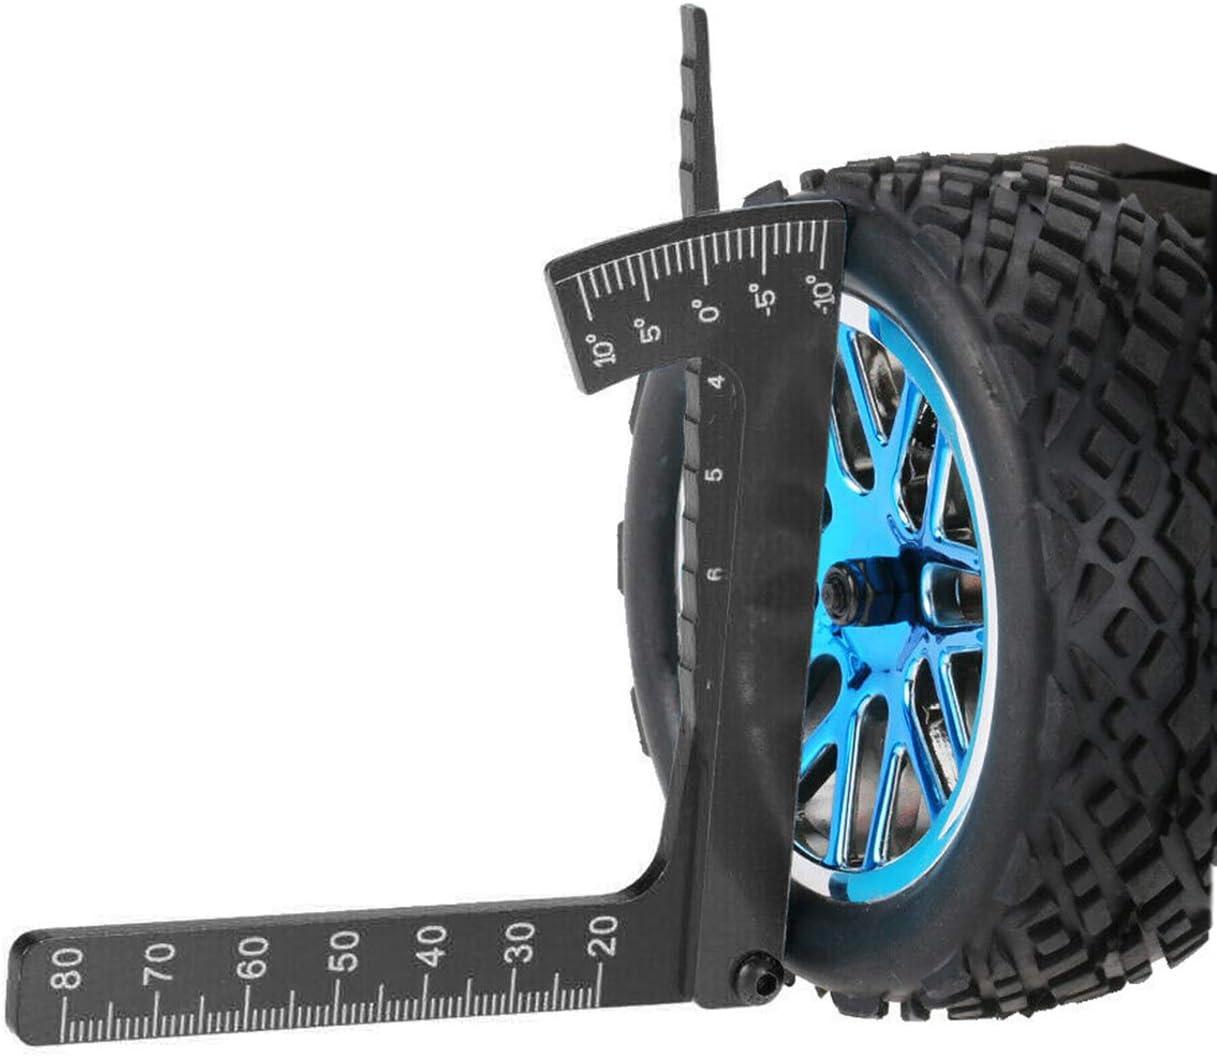 Adjustable Ruler RC Car Wheel Rim Camber Height Tires Angle Balance RuleNWUS